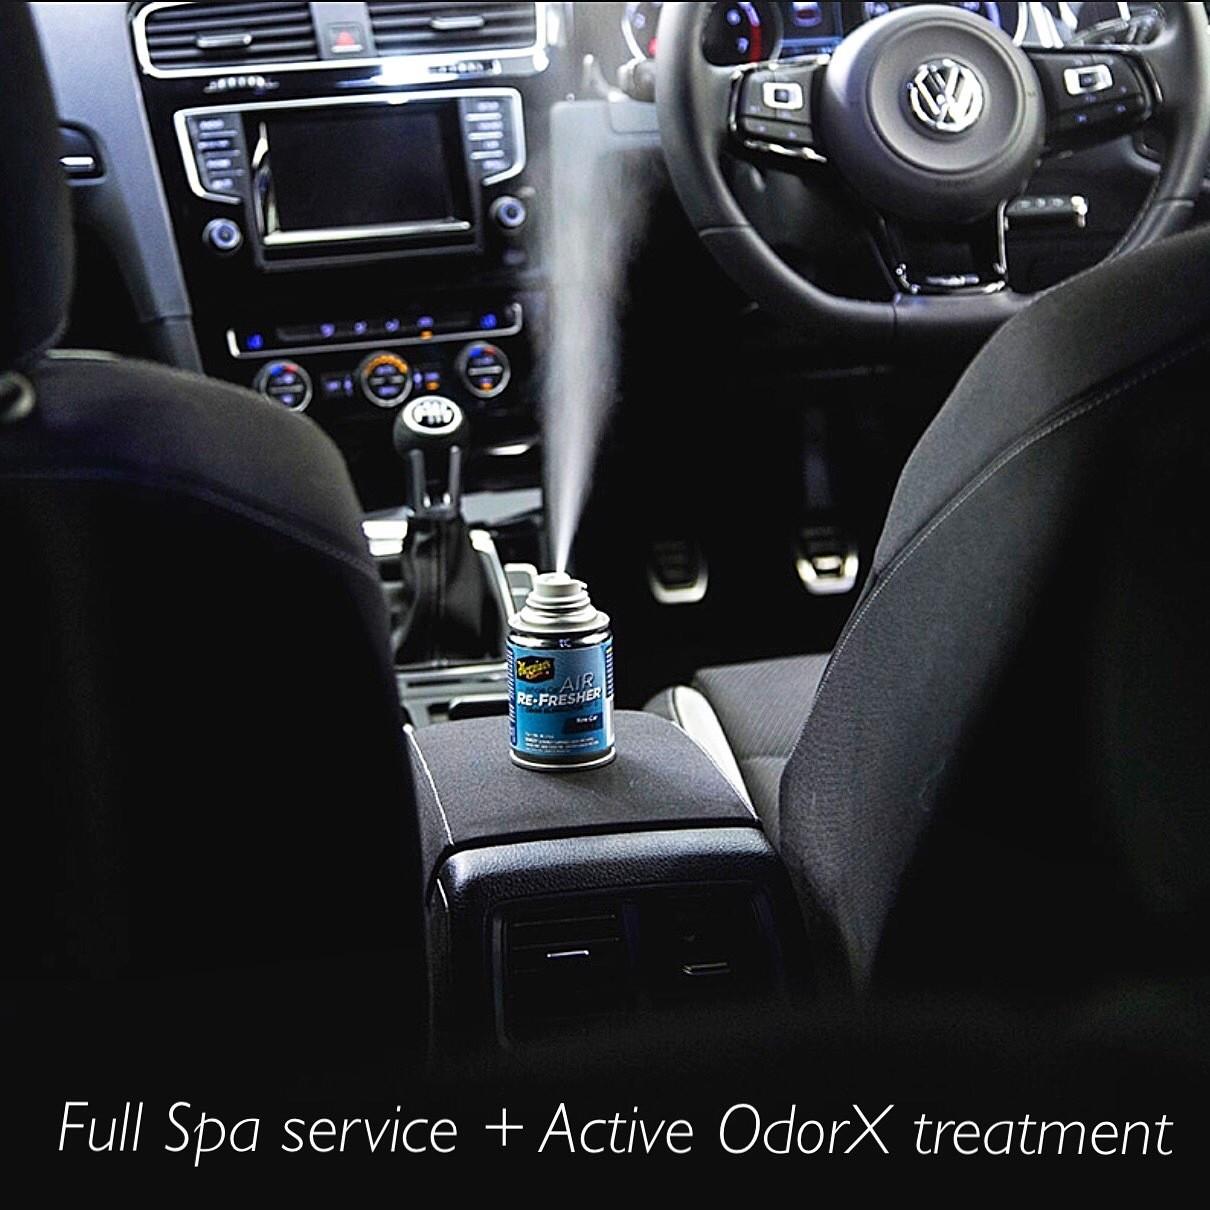 Interior Only: Full Steam + Active OdorX